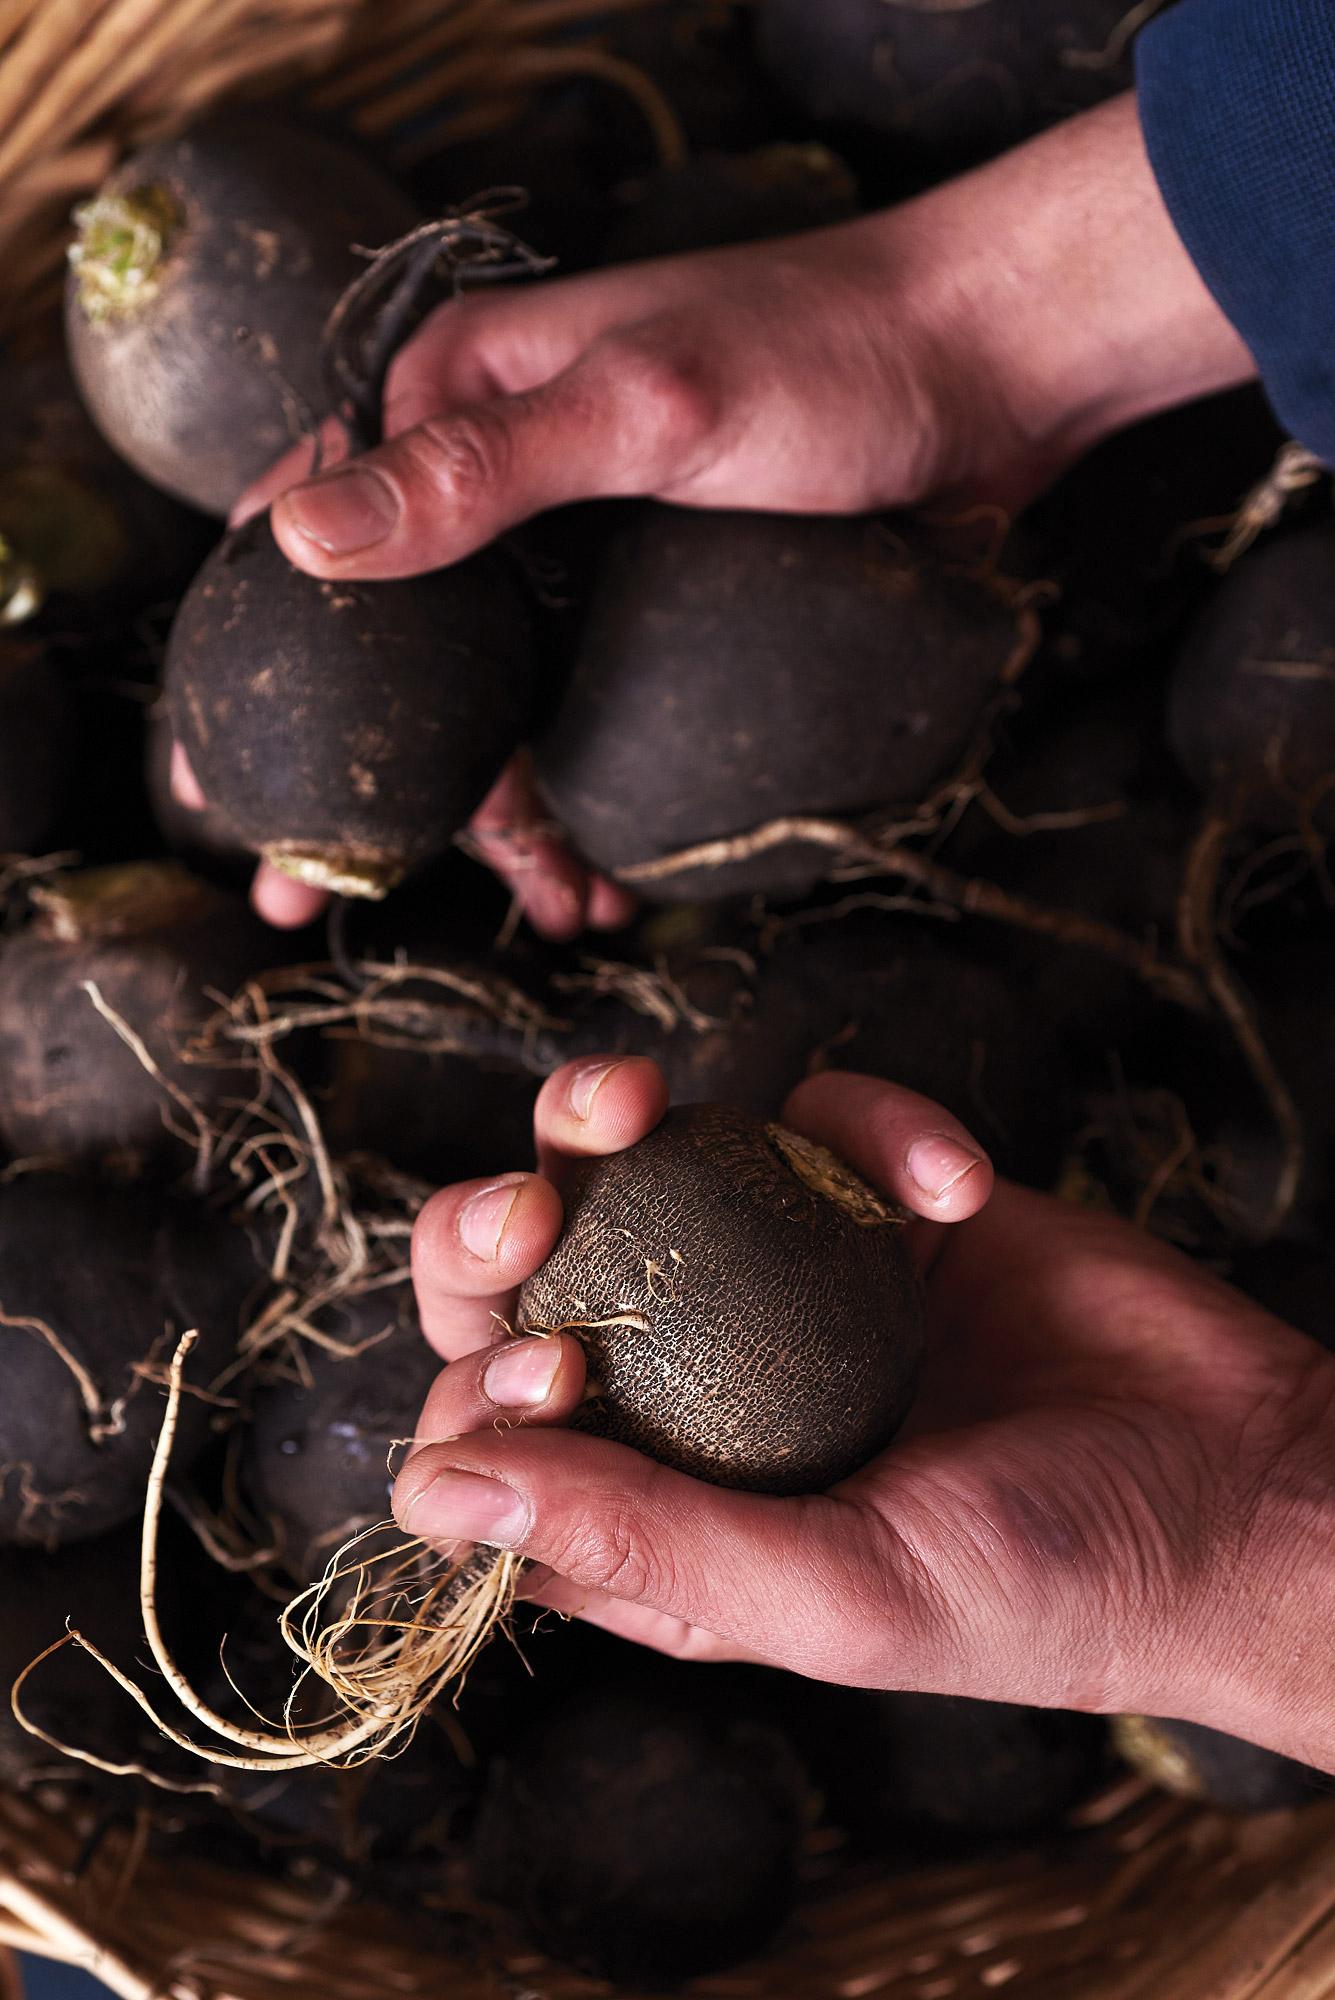 Loic Le Guen, Blooming Glen Farm, black radish